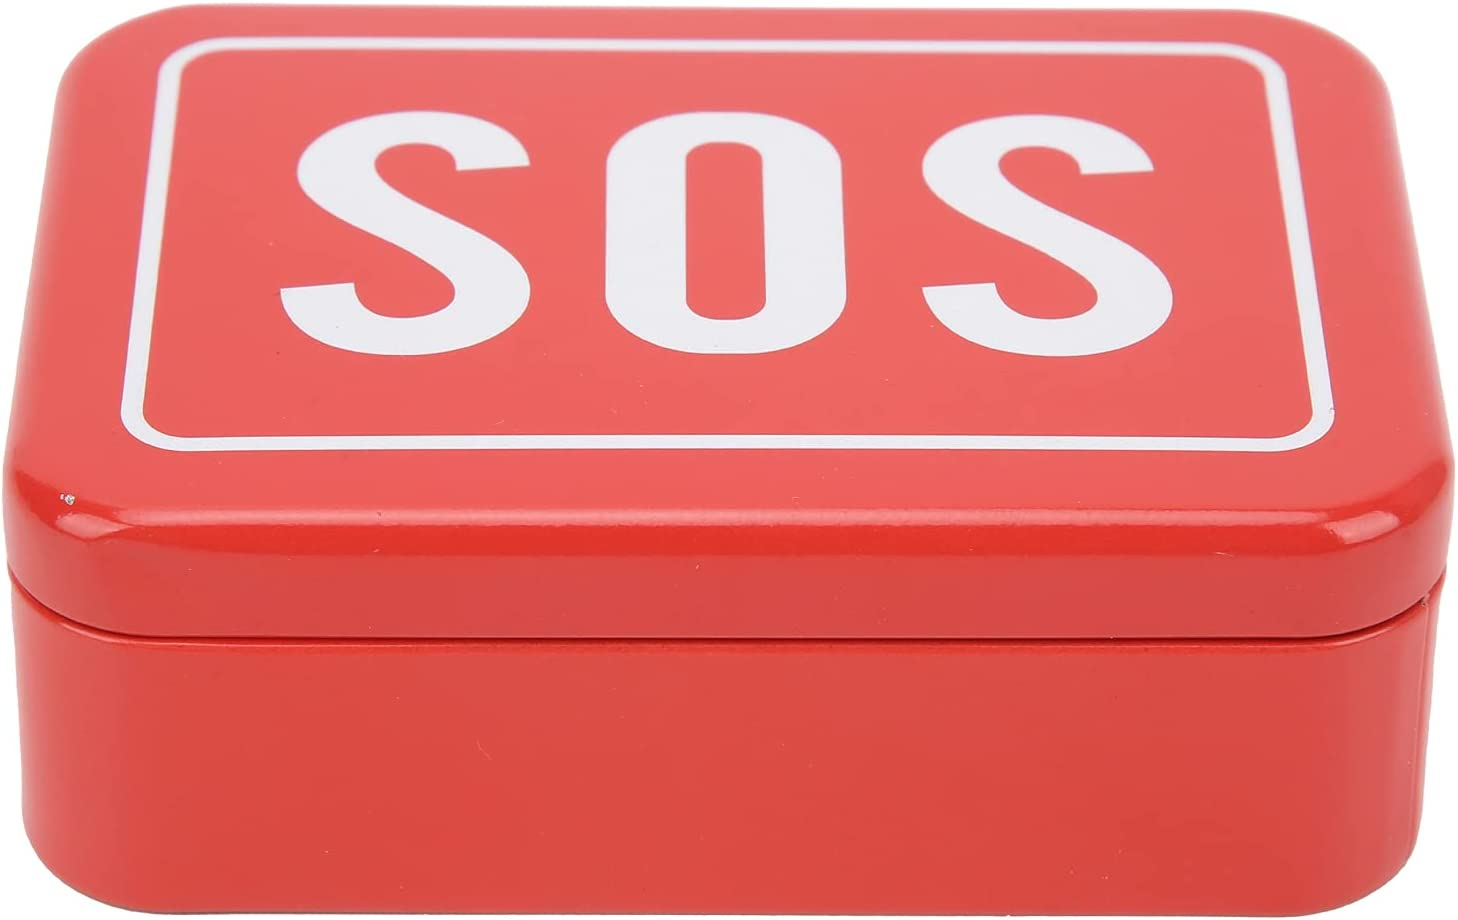 mart 01 SOS Case Portable Stainless Mutiple-use Classic Steel Lifesaving Box